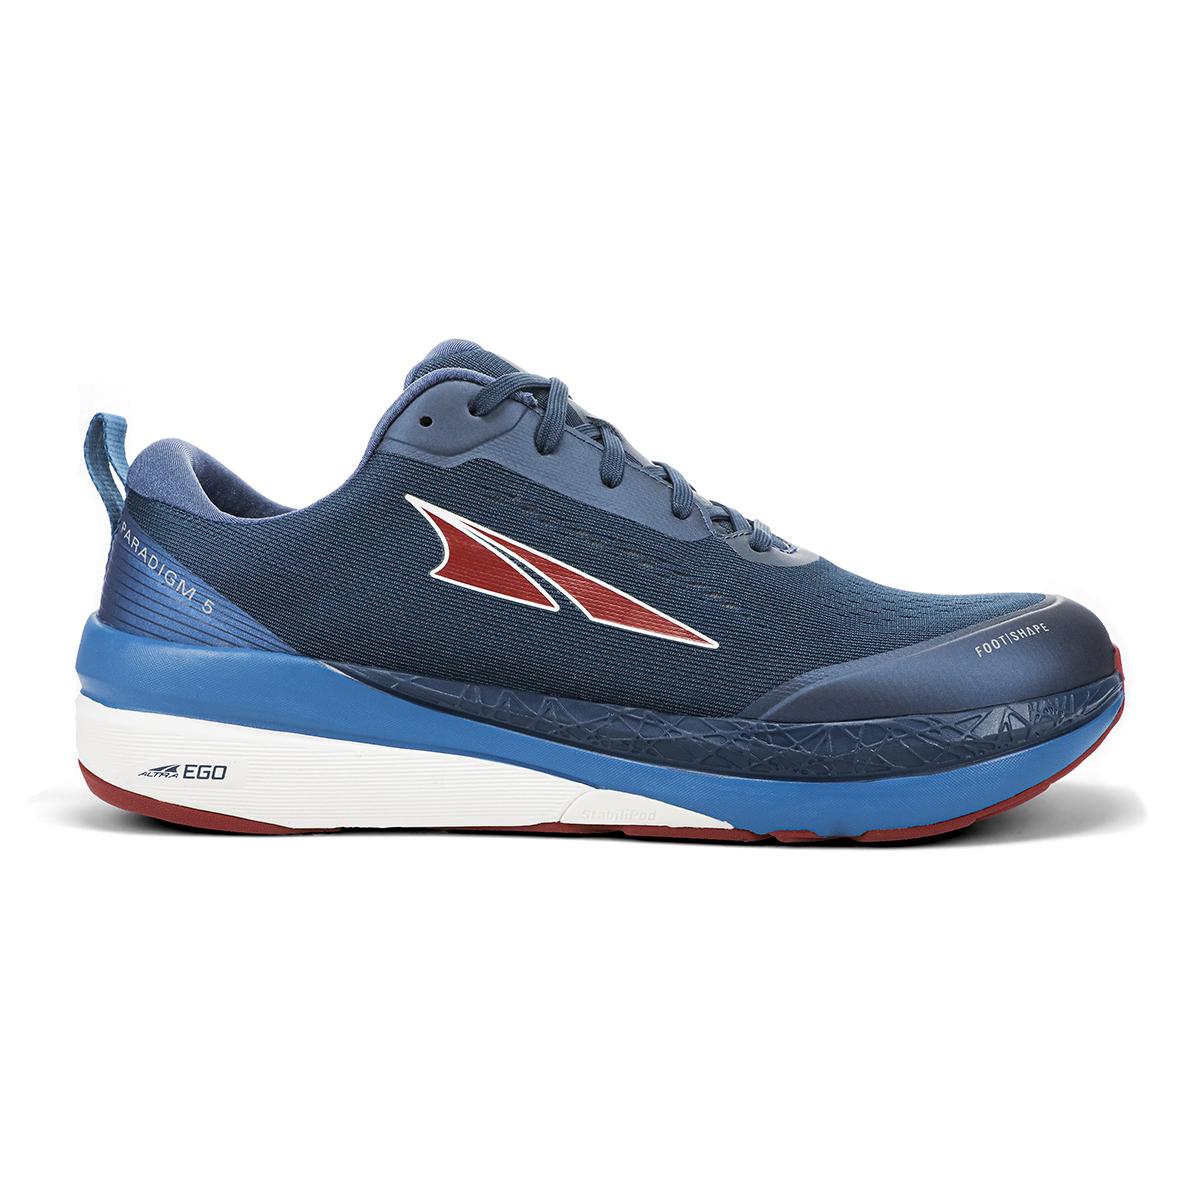 Men's Altra Paradigm 5 Running Shoe - Color: Blue Red - Size: 8.5 - Width: Regular, Blue Red, large, image 1